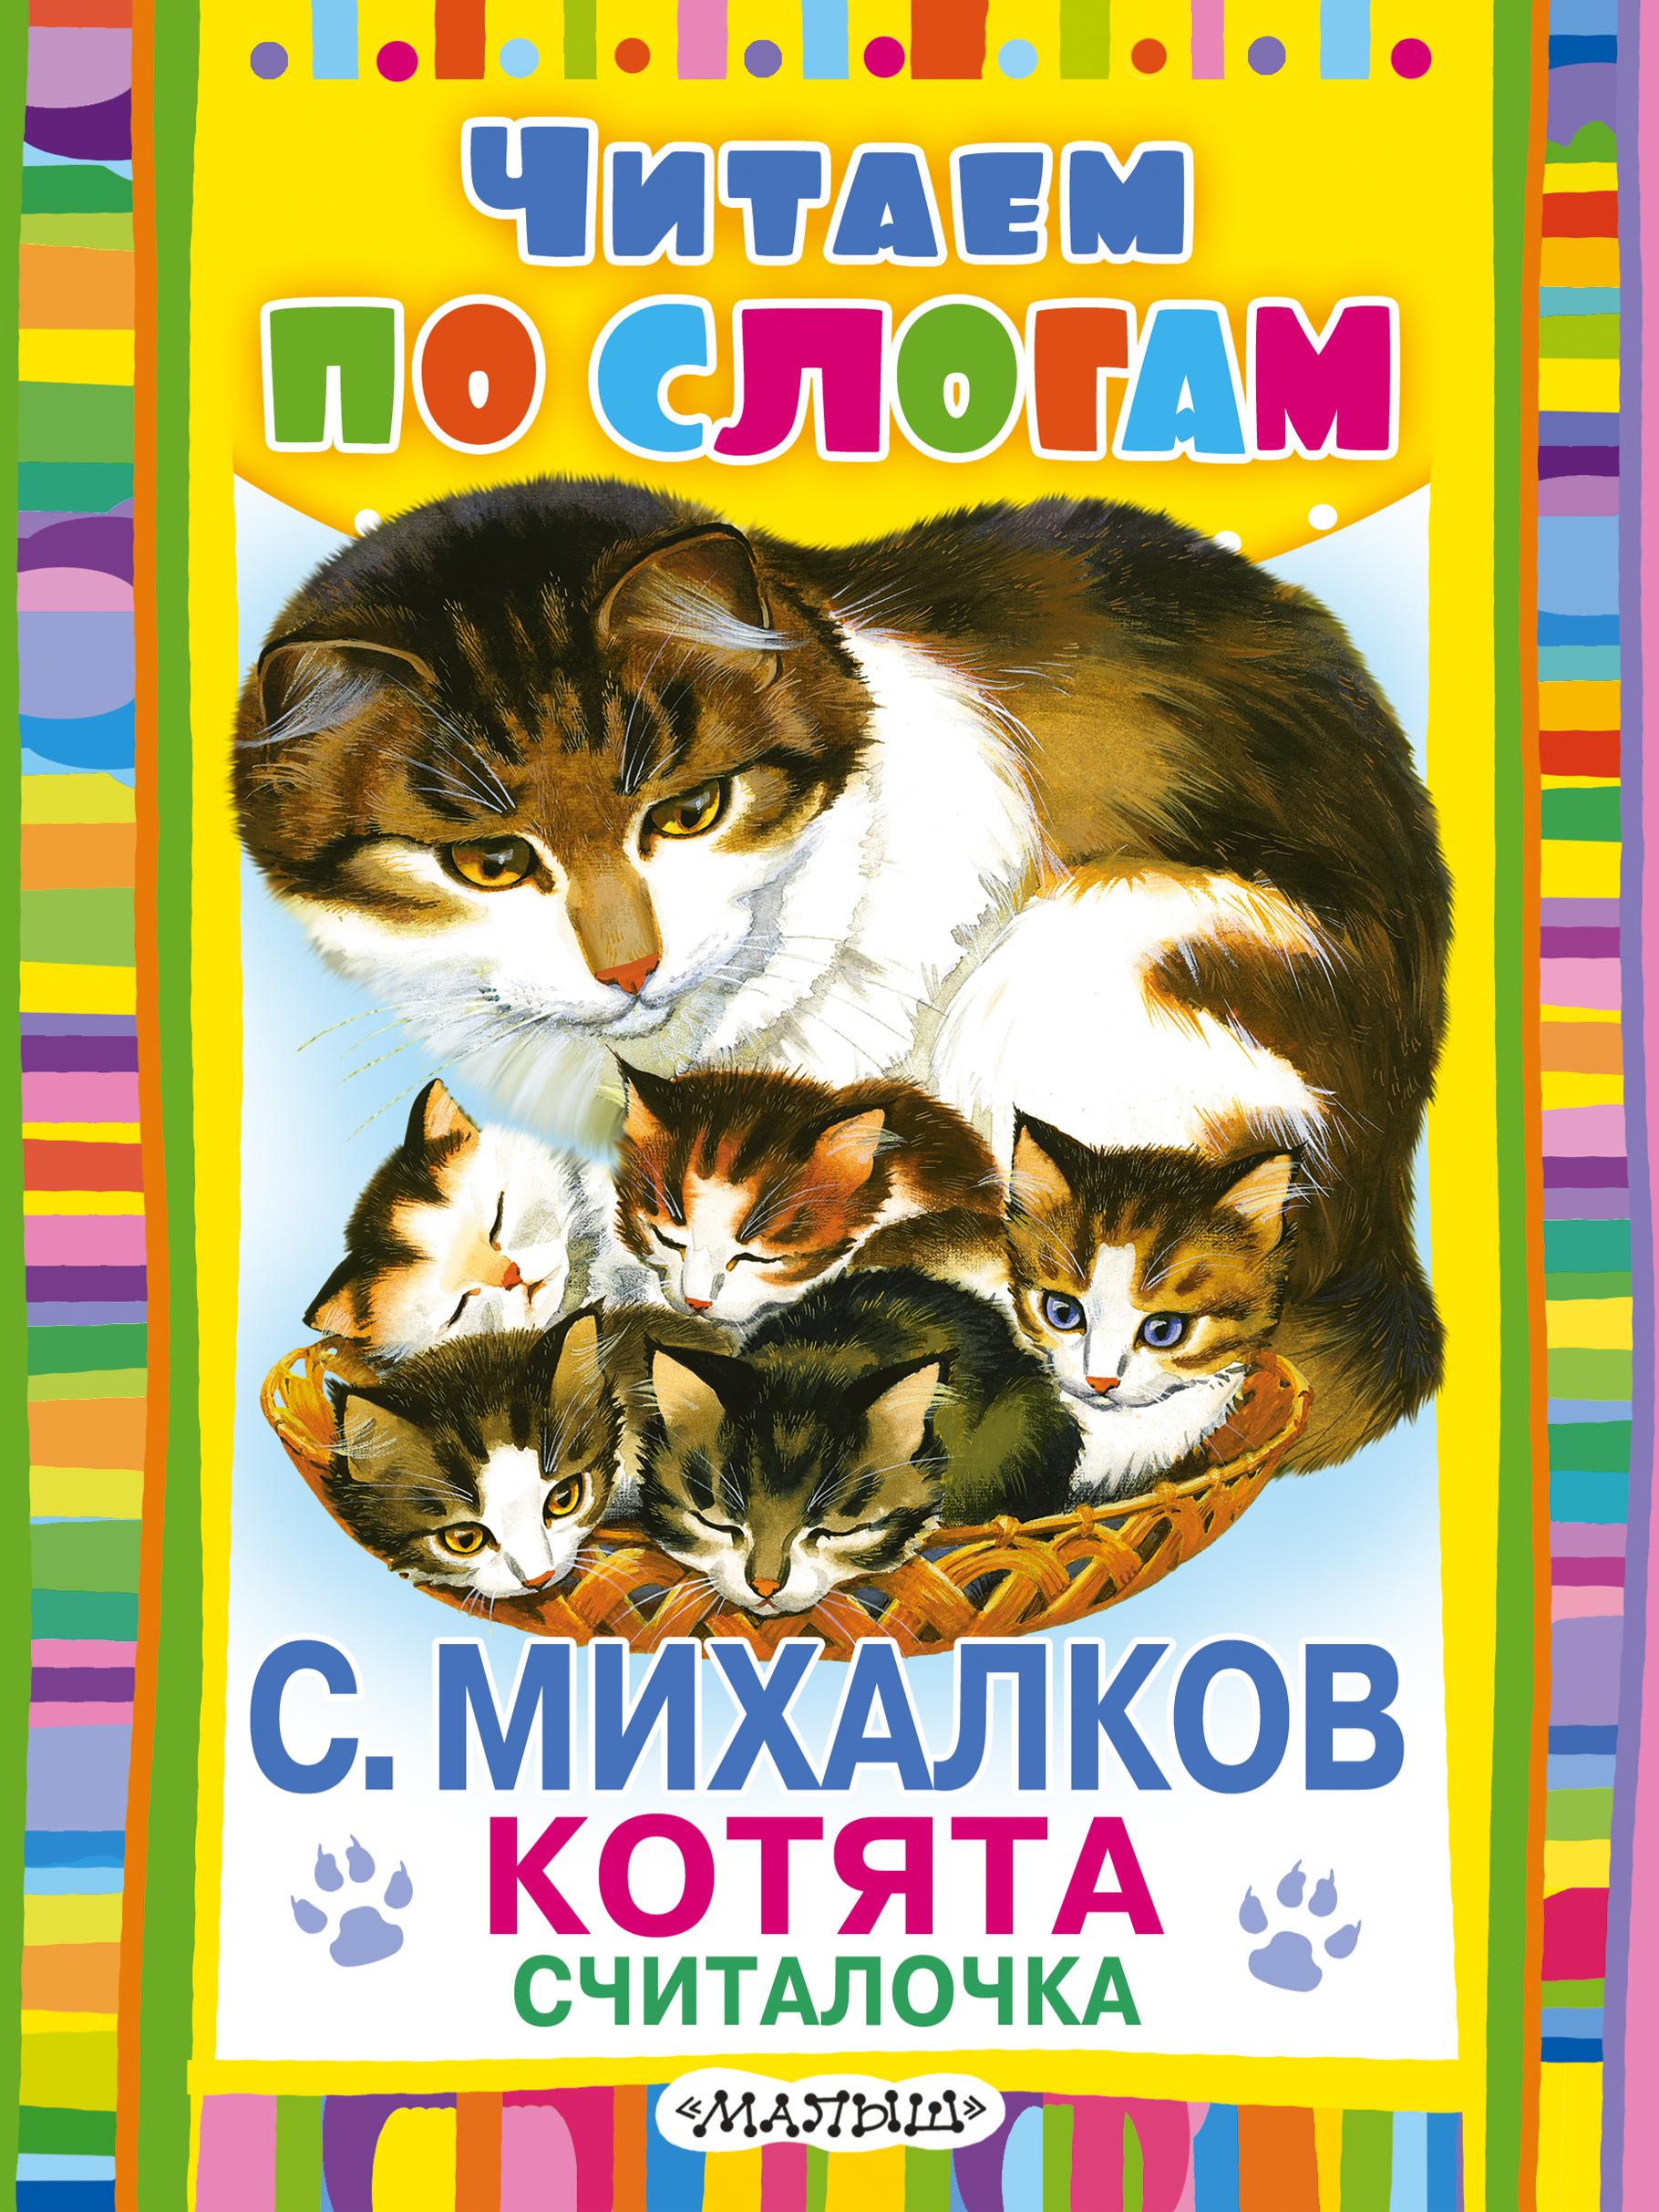 Котята (Считалочка)